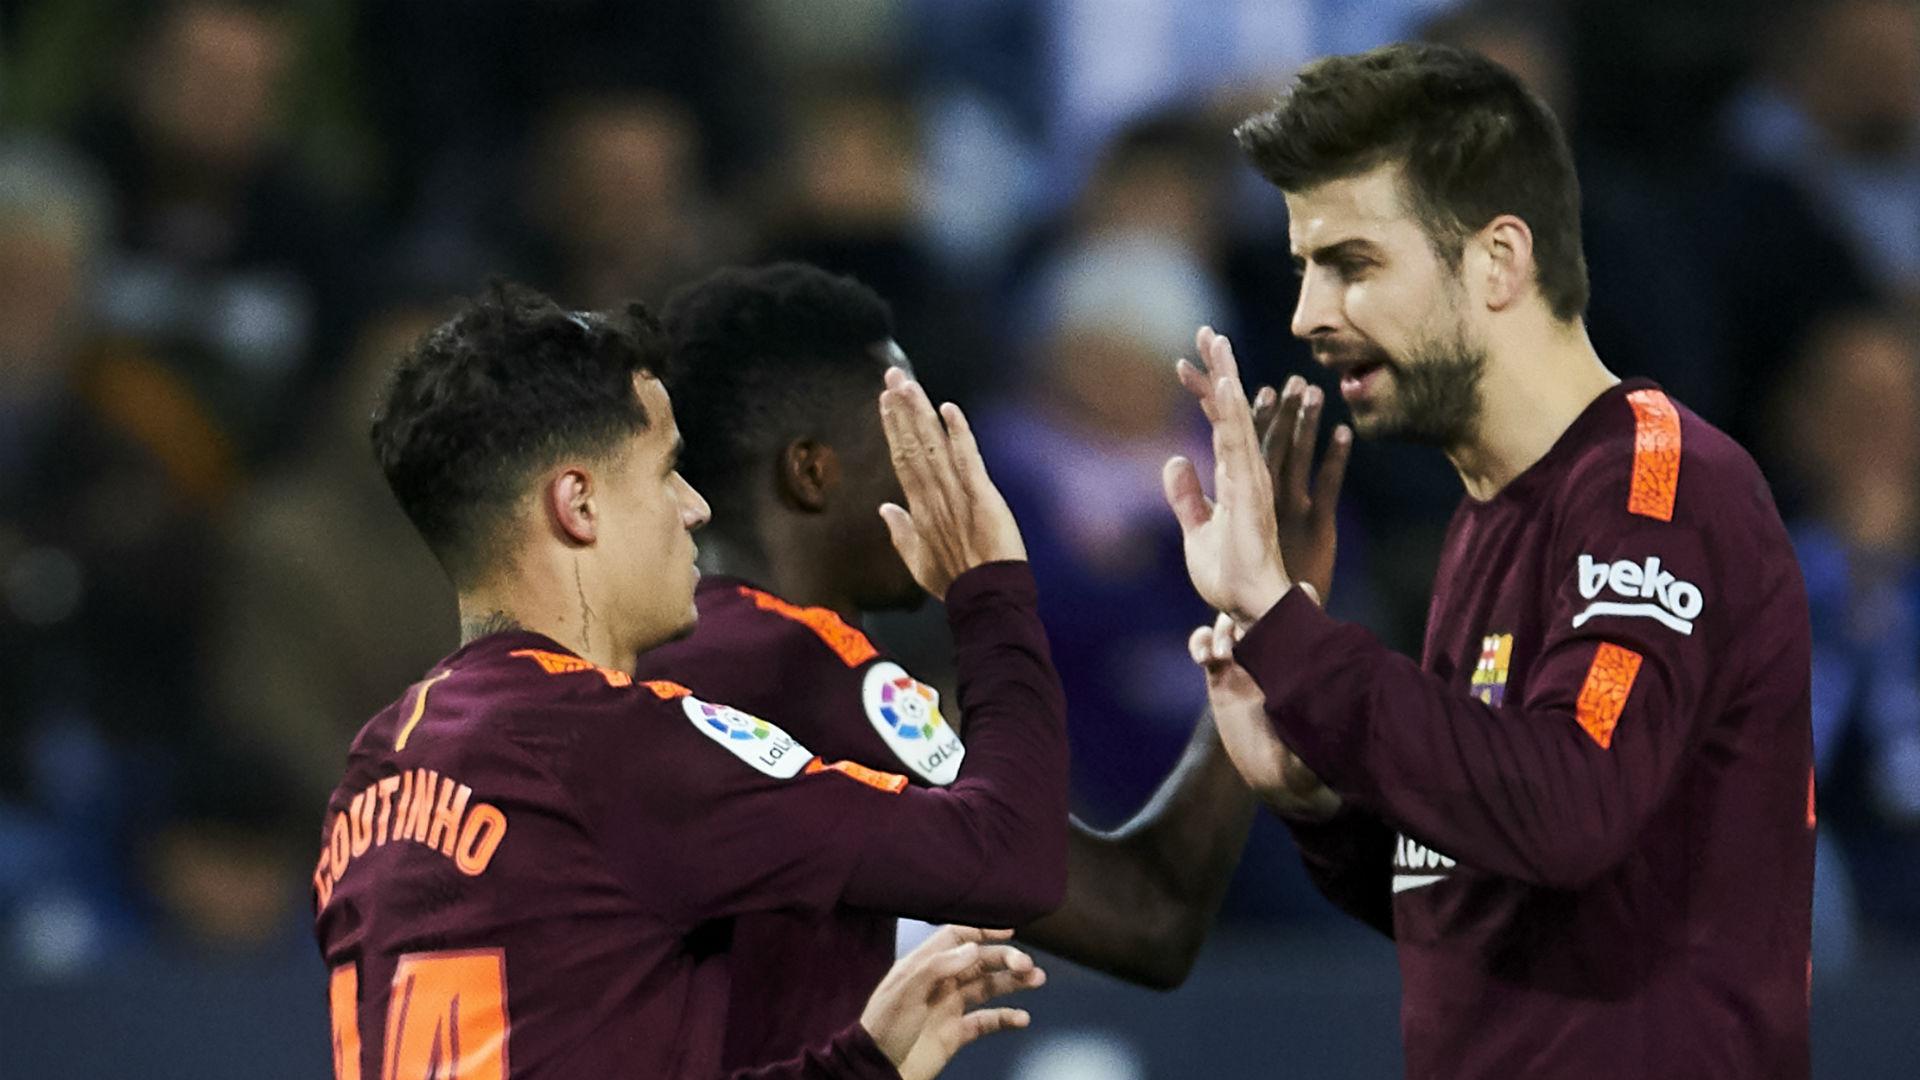 новости футбола - Пике поддержал Коутиньо, 10 марта 2019 года